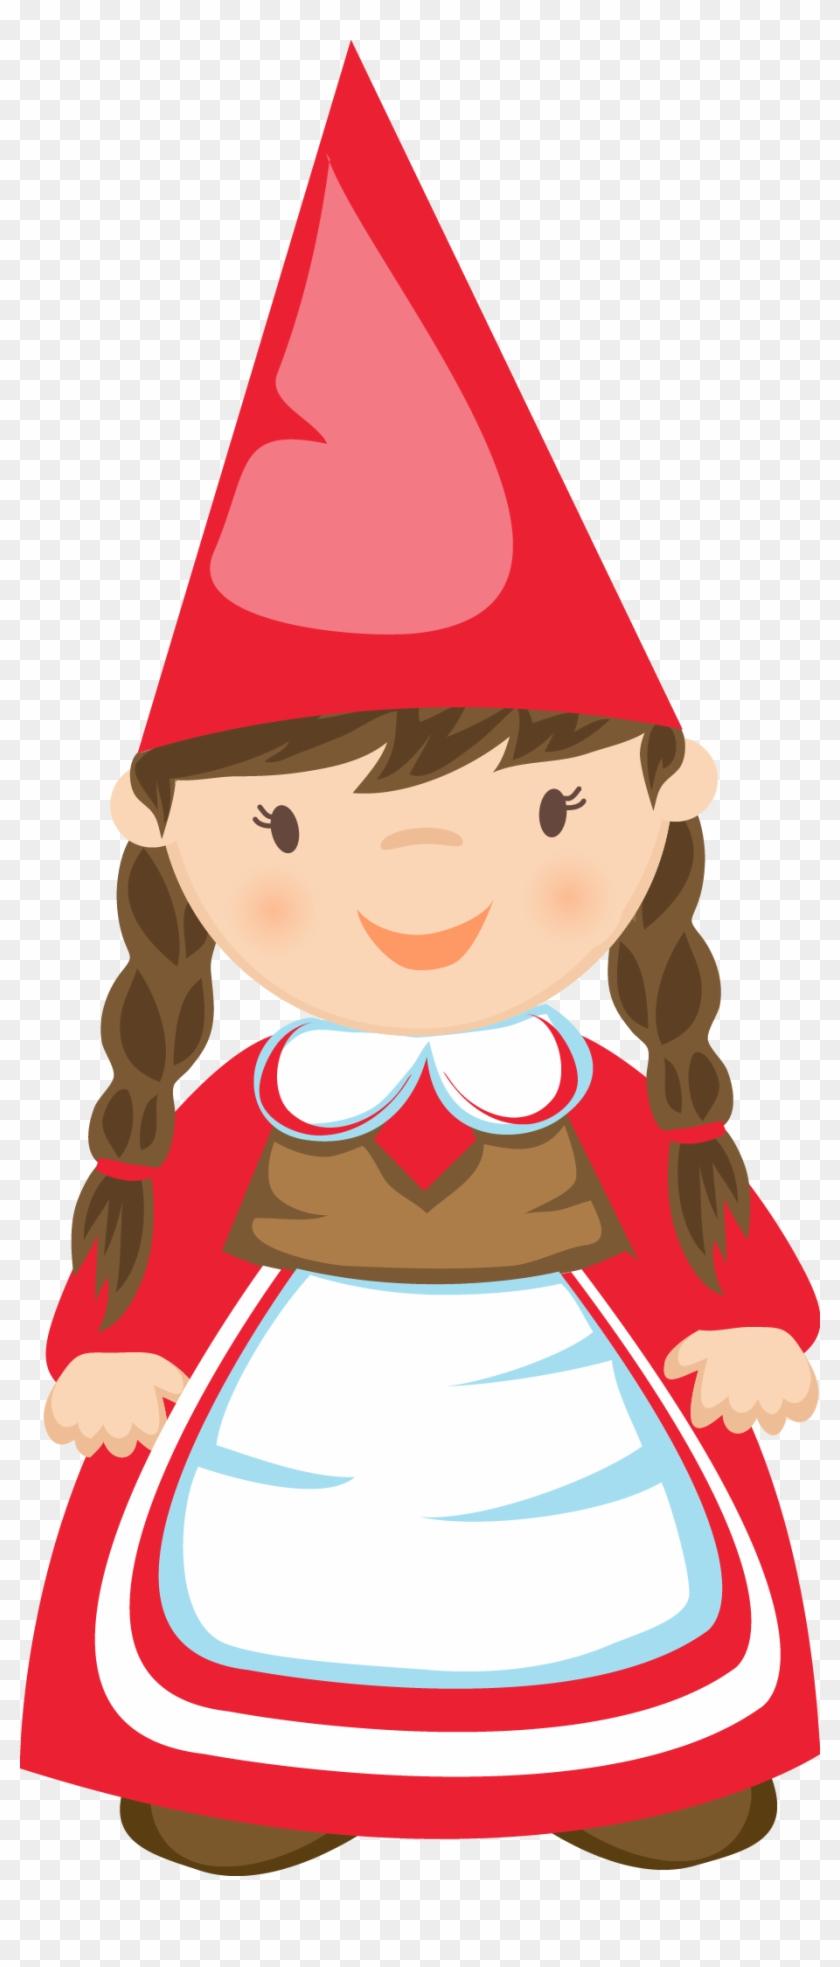 Gnome Clip Art: Free Transparent PNG